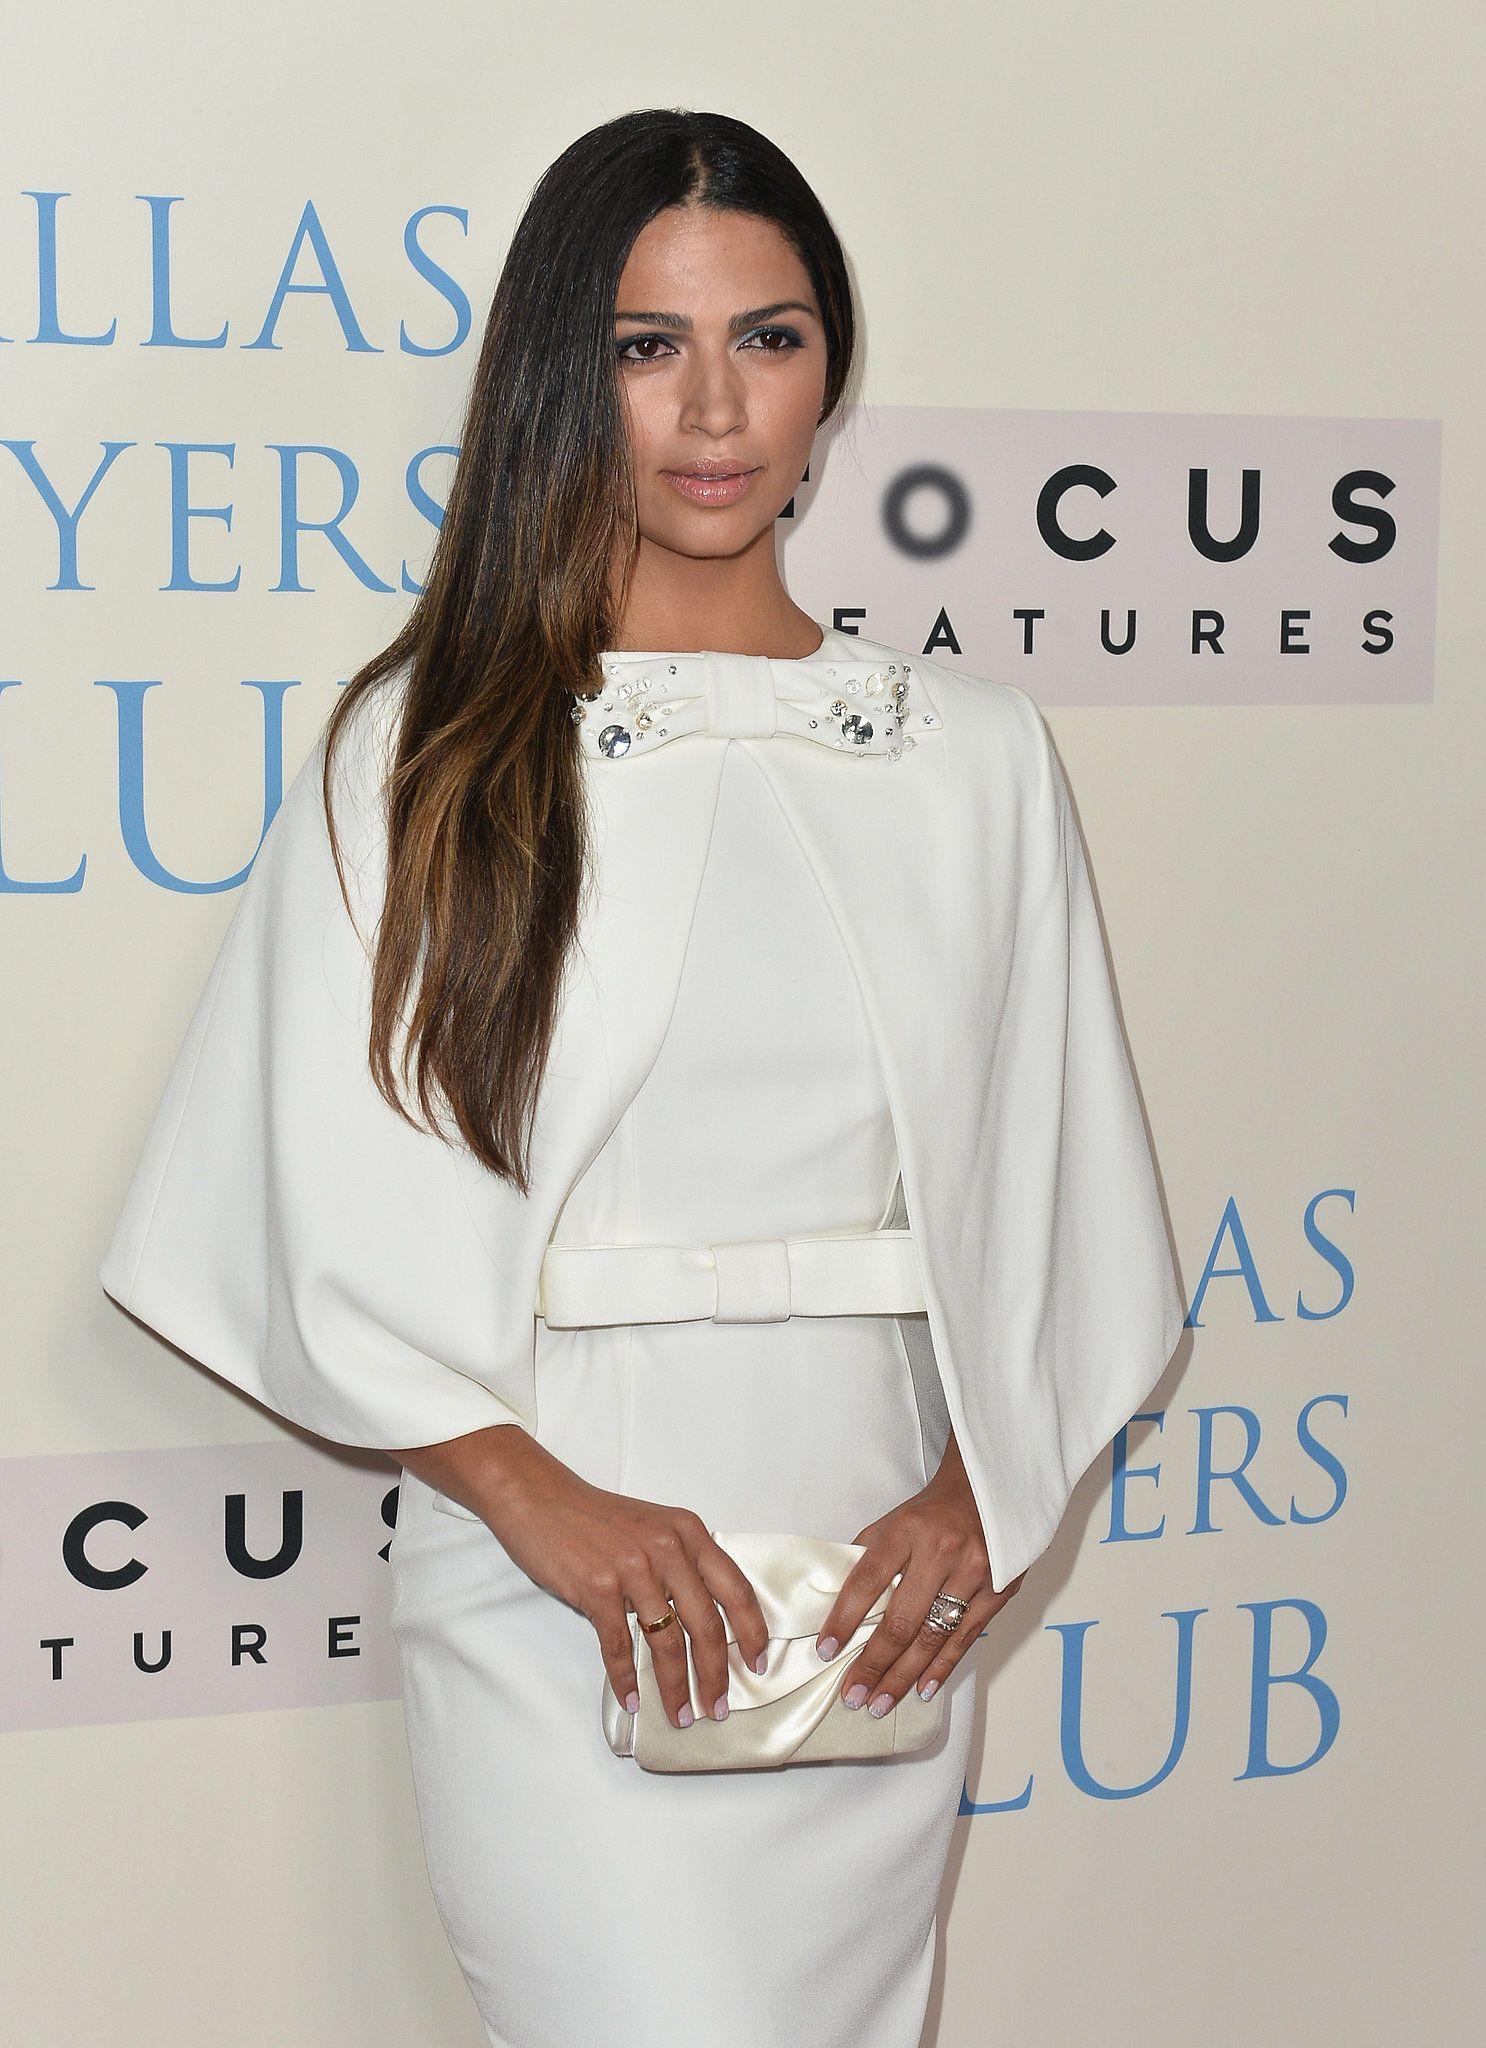 2013, Dallas Buyers Club premiere Fashion, Diva fashion